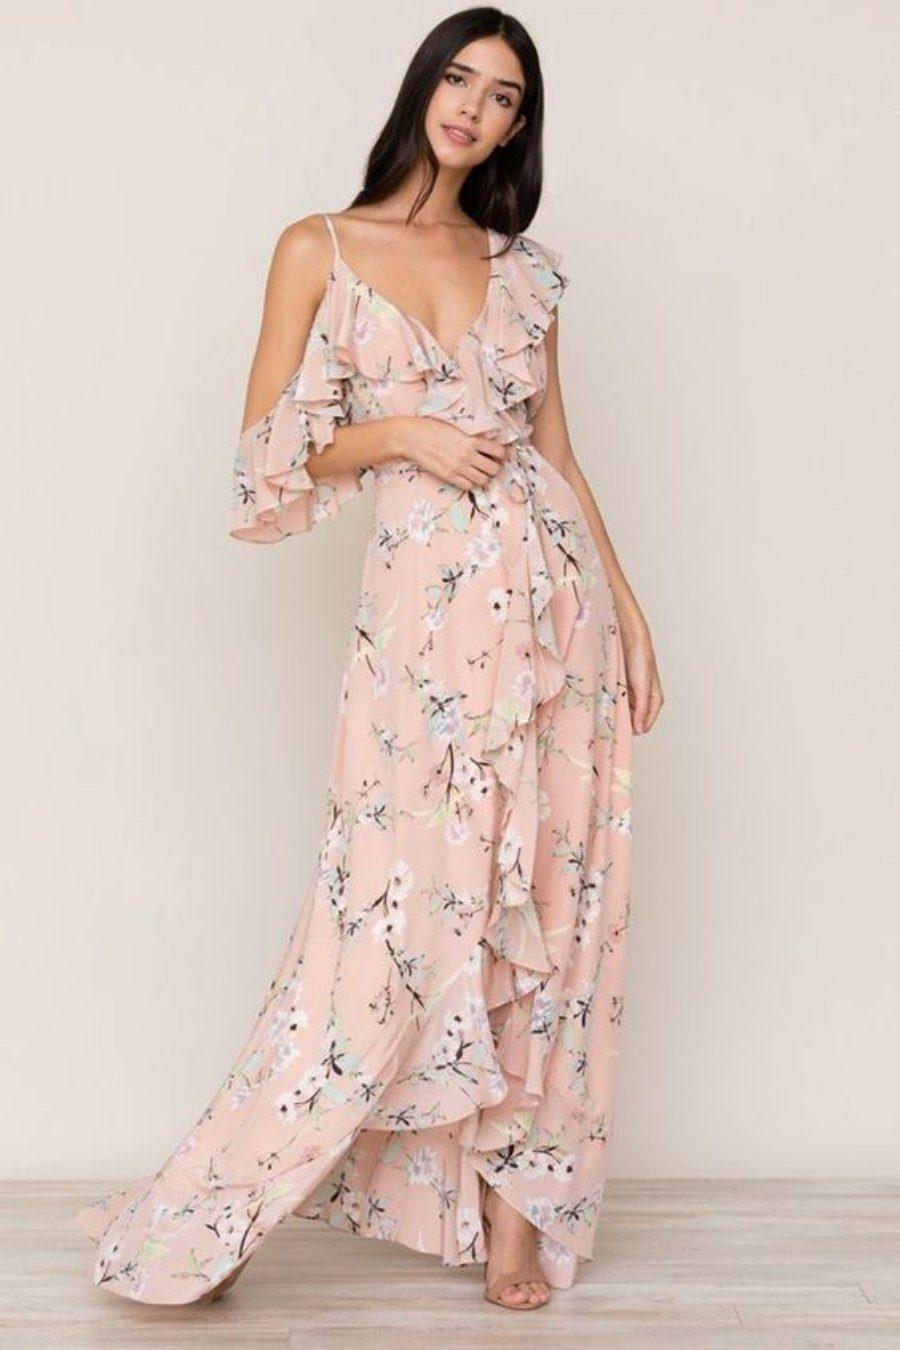 Moda anti-idade: Primavera romântica - vestido florido rosé